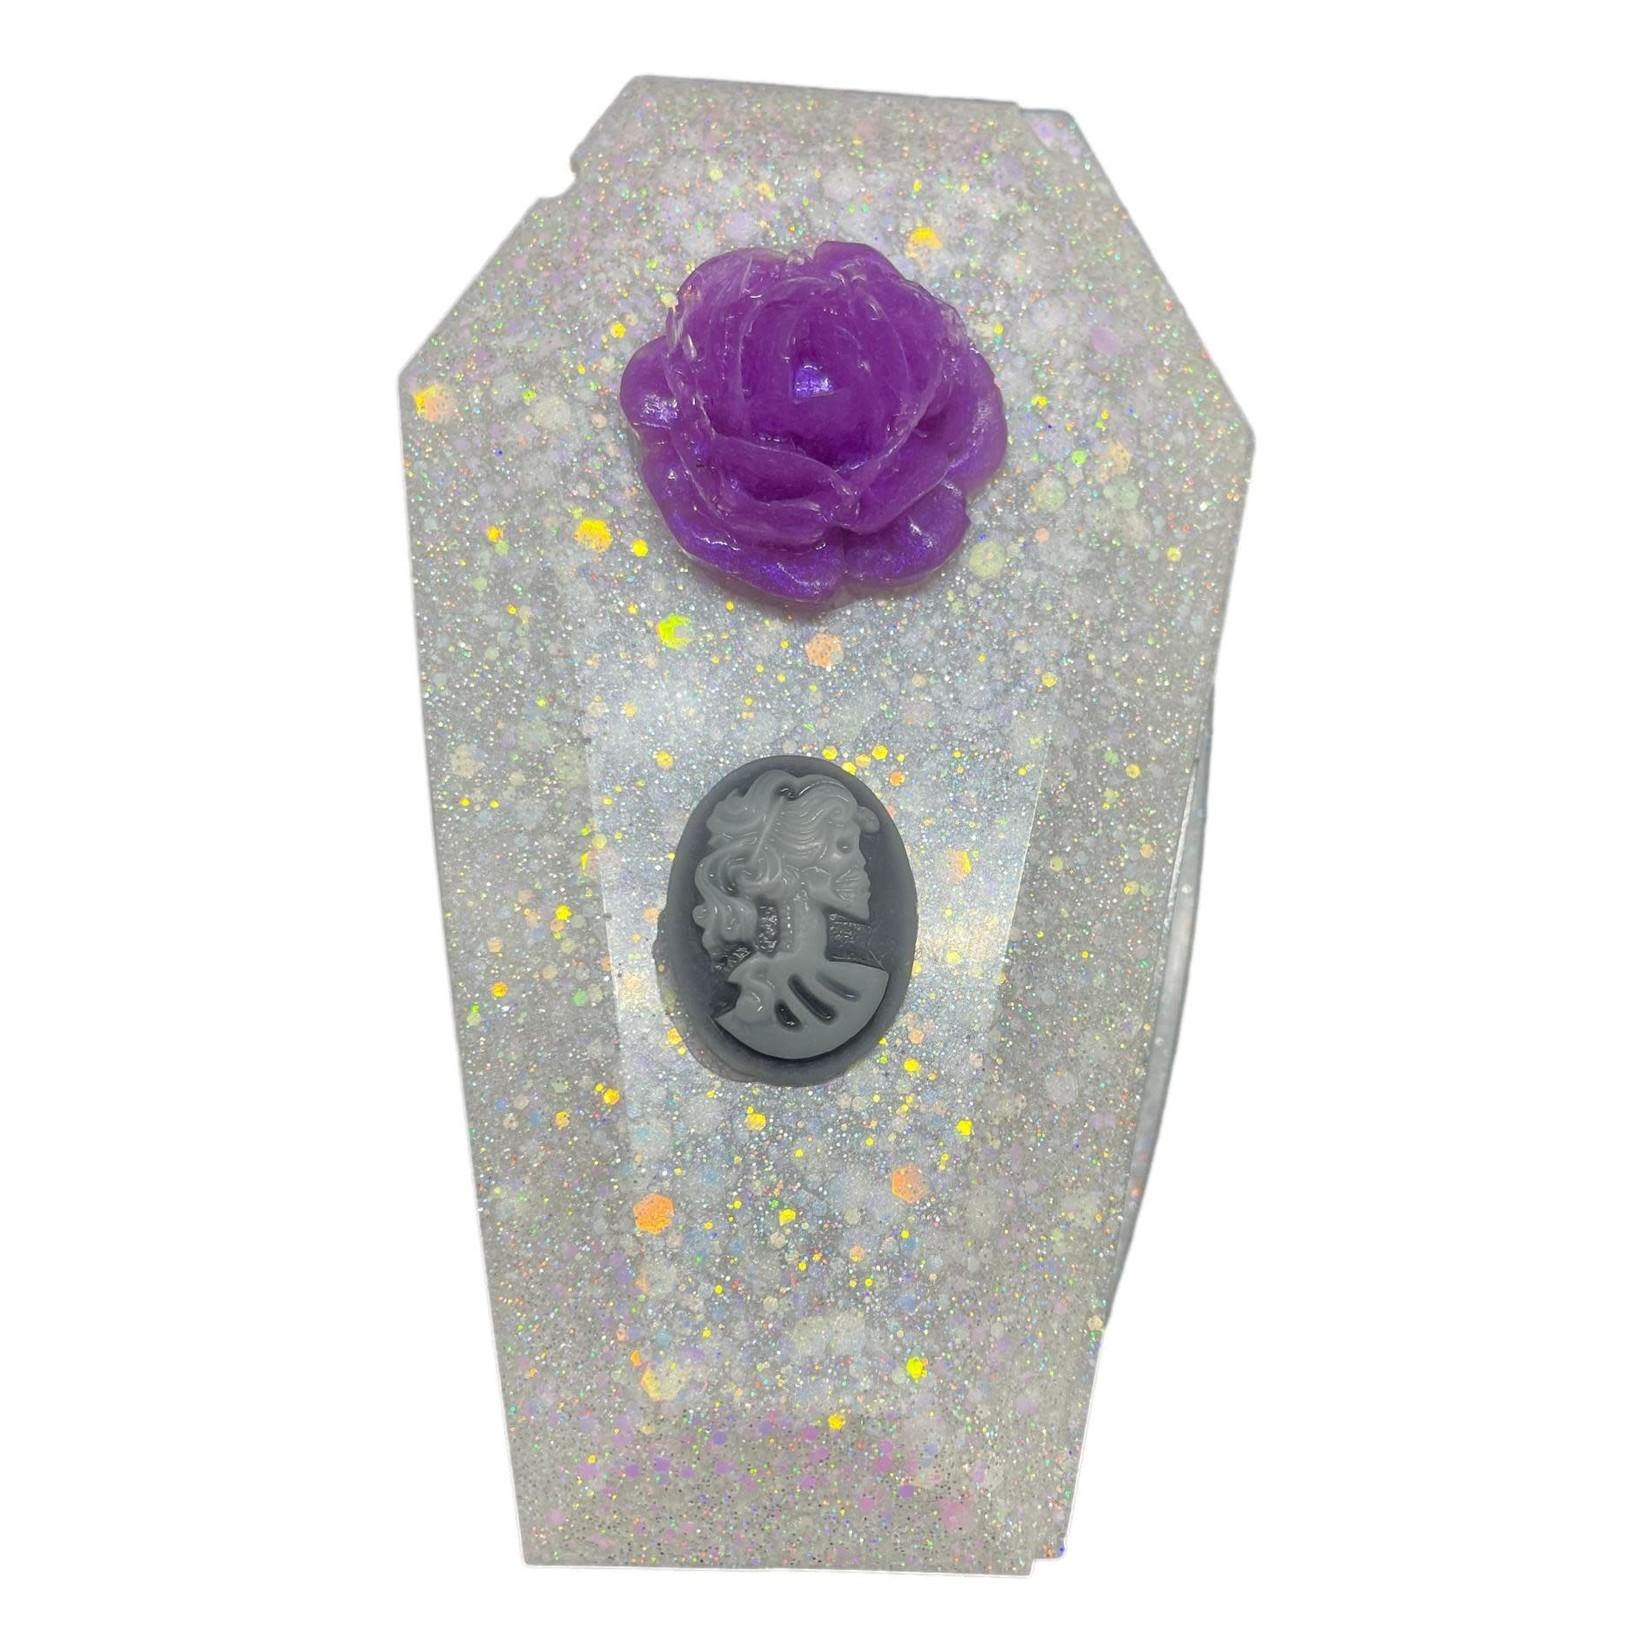 East Coast Sirens White Glitter Coffin Trinket Box